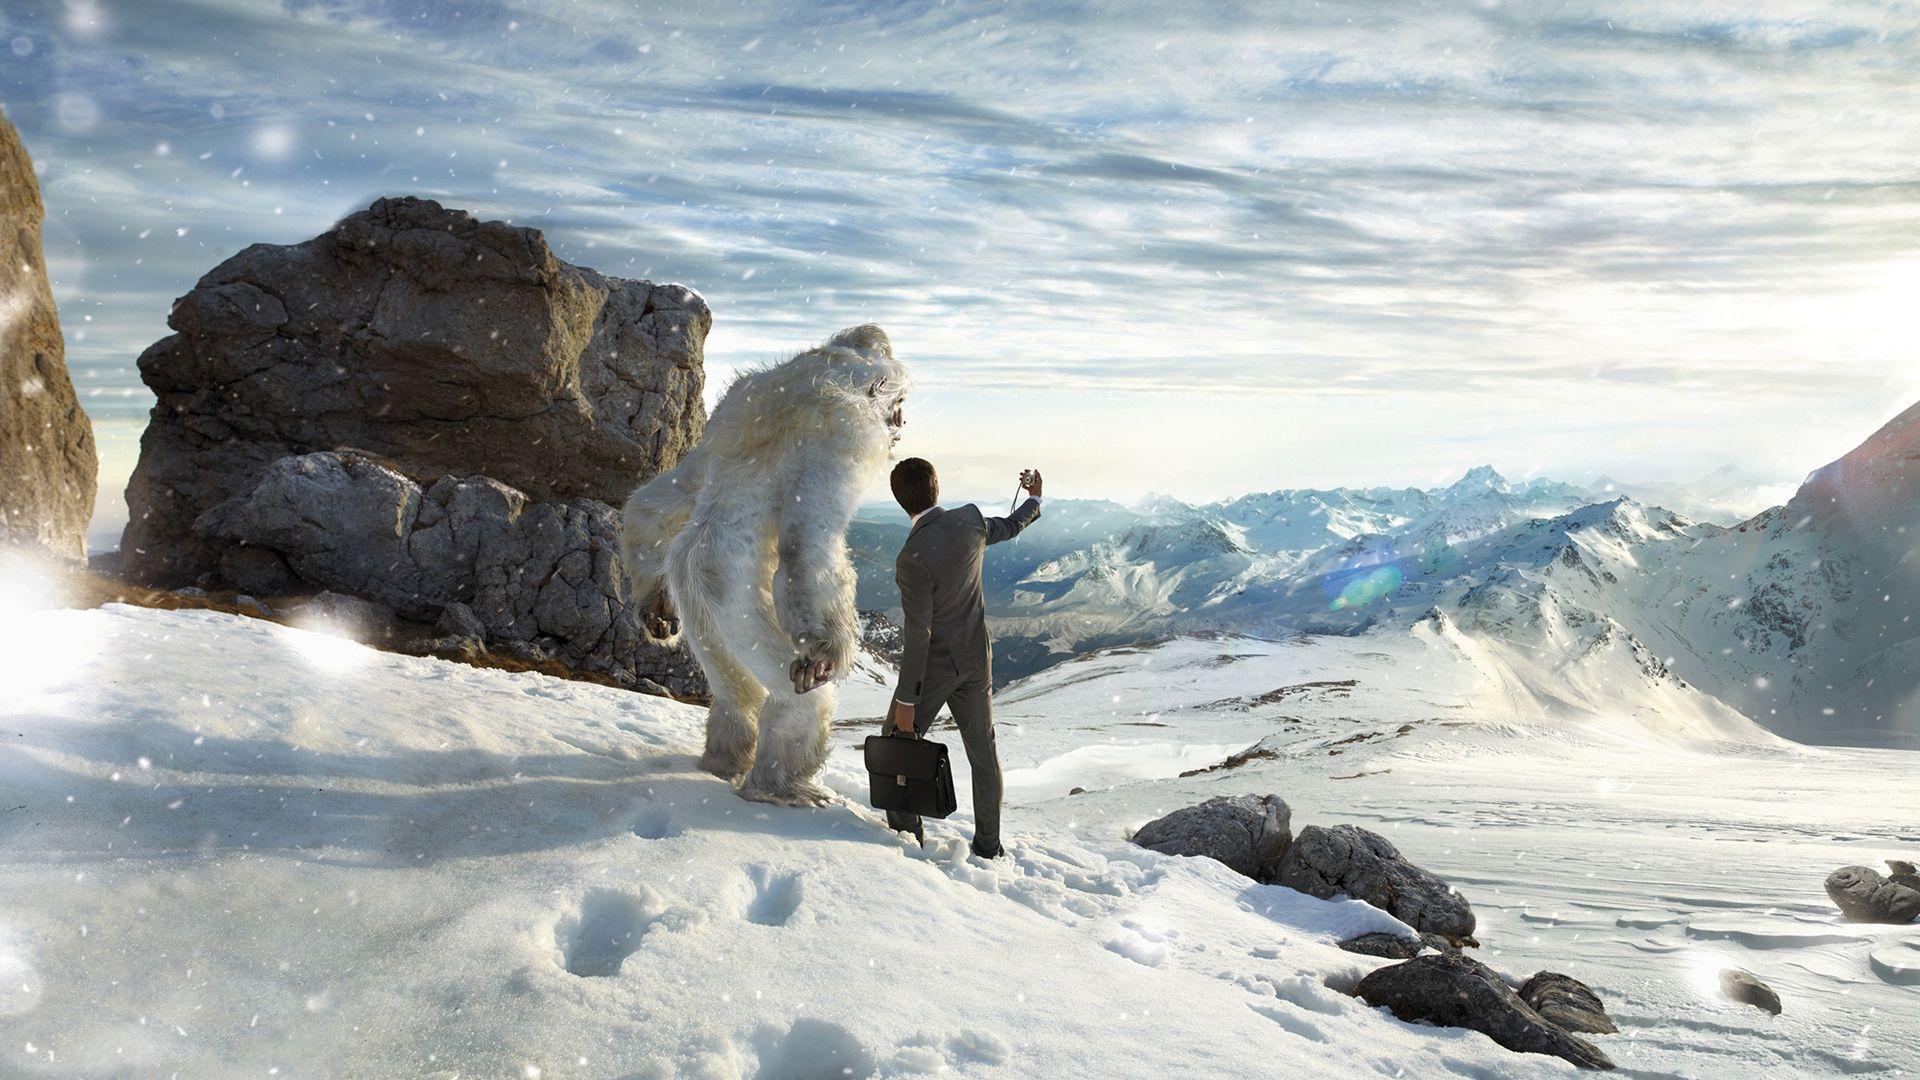 Bigfoot wallpaper image